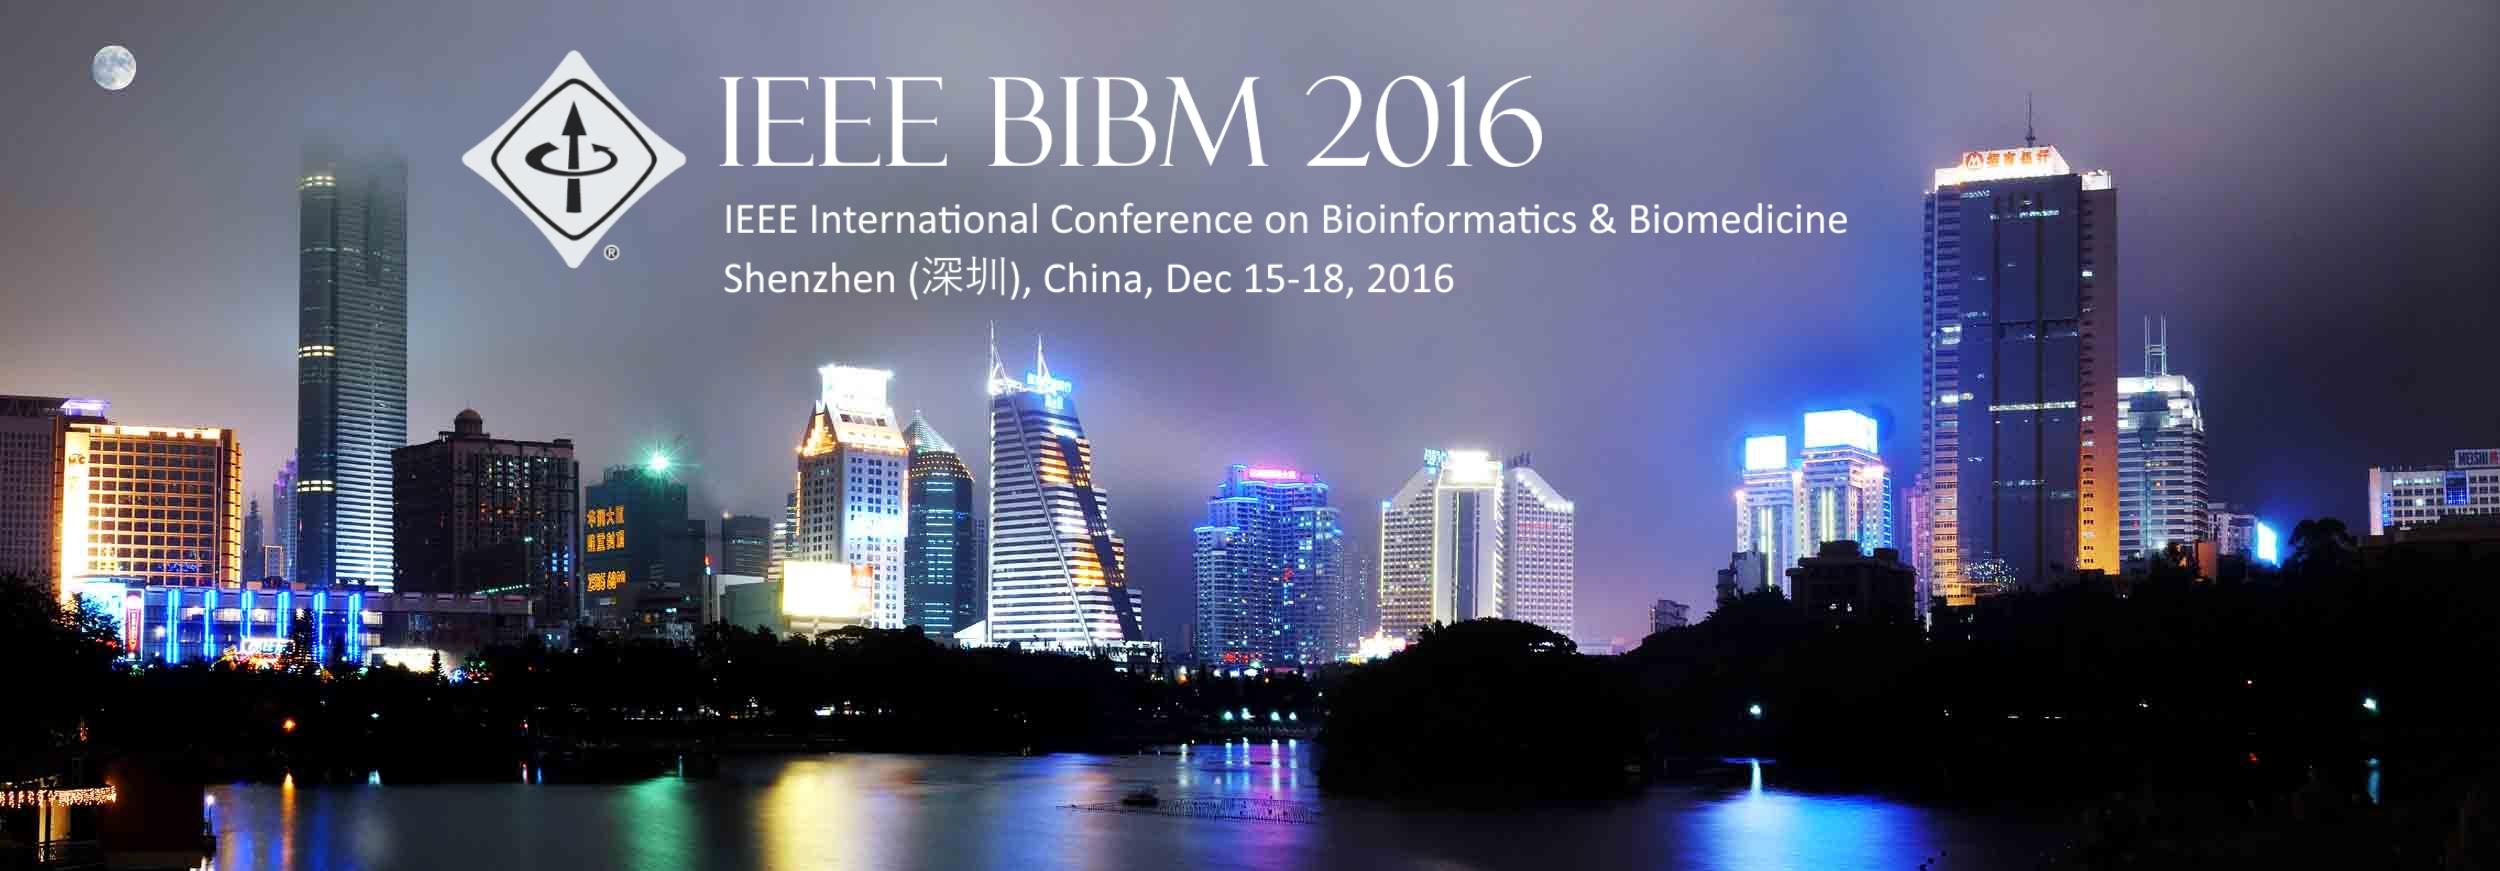 IEEE BIBM 2016